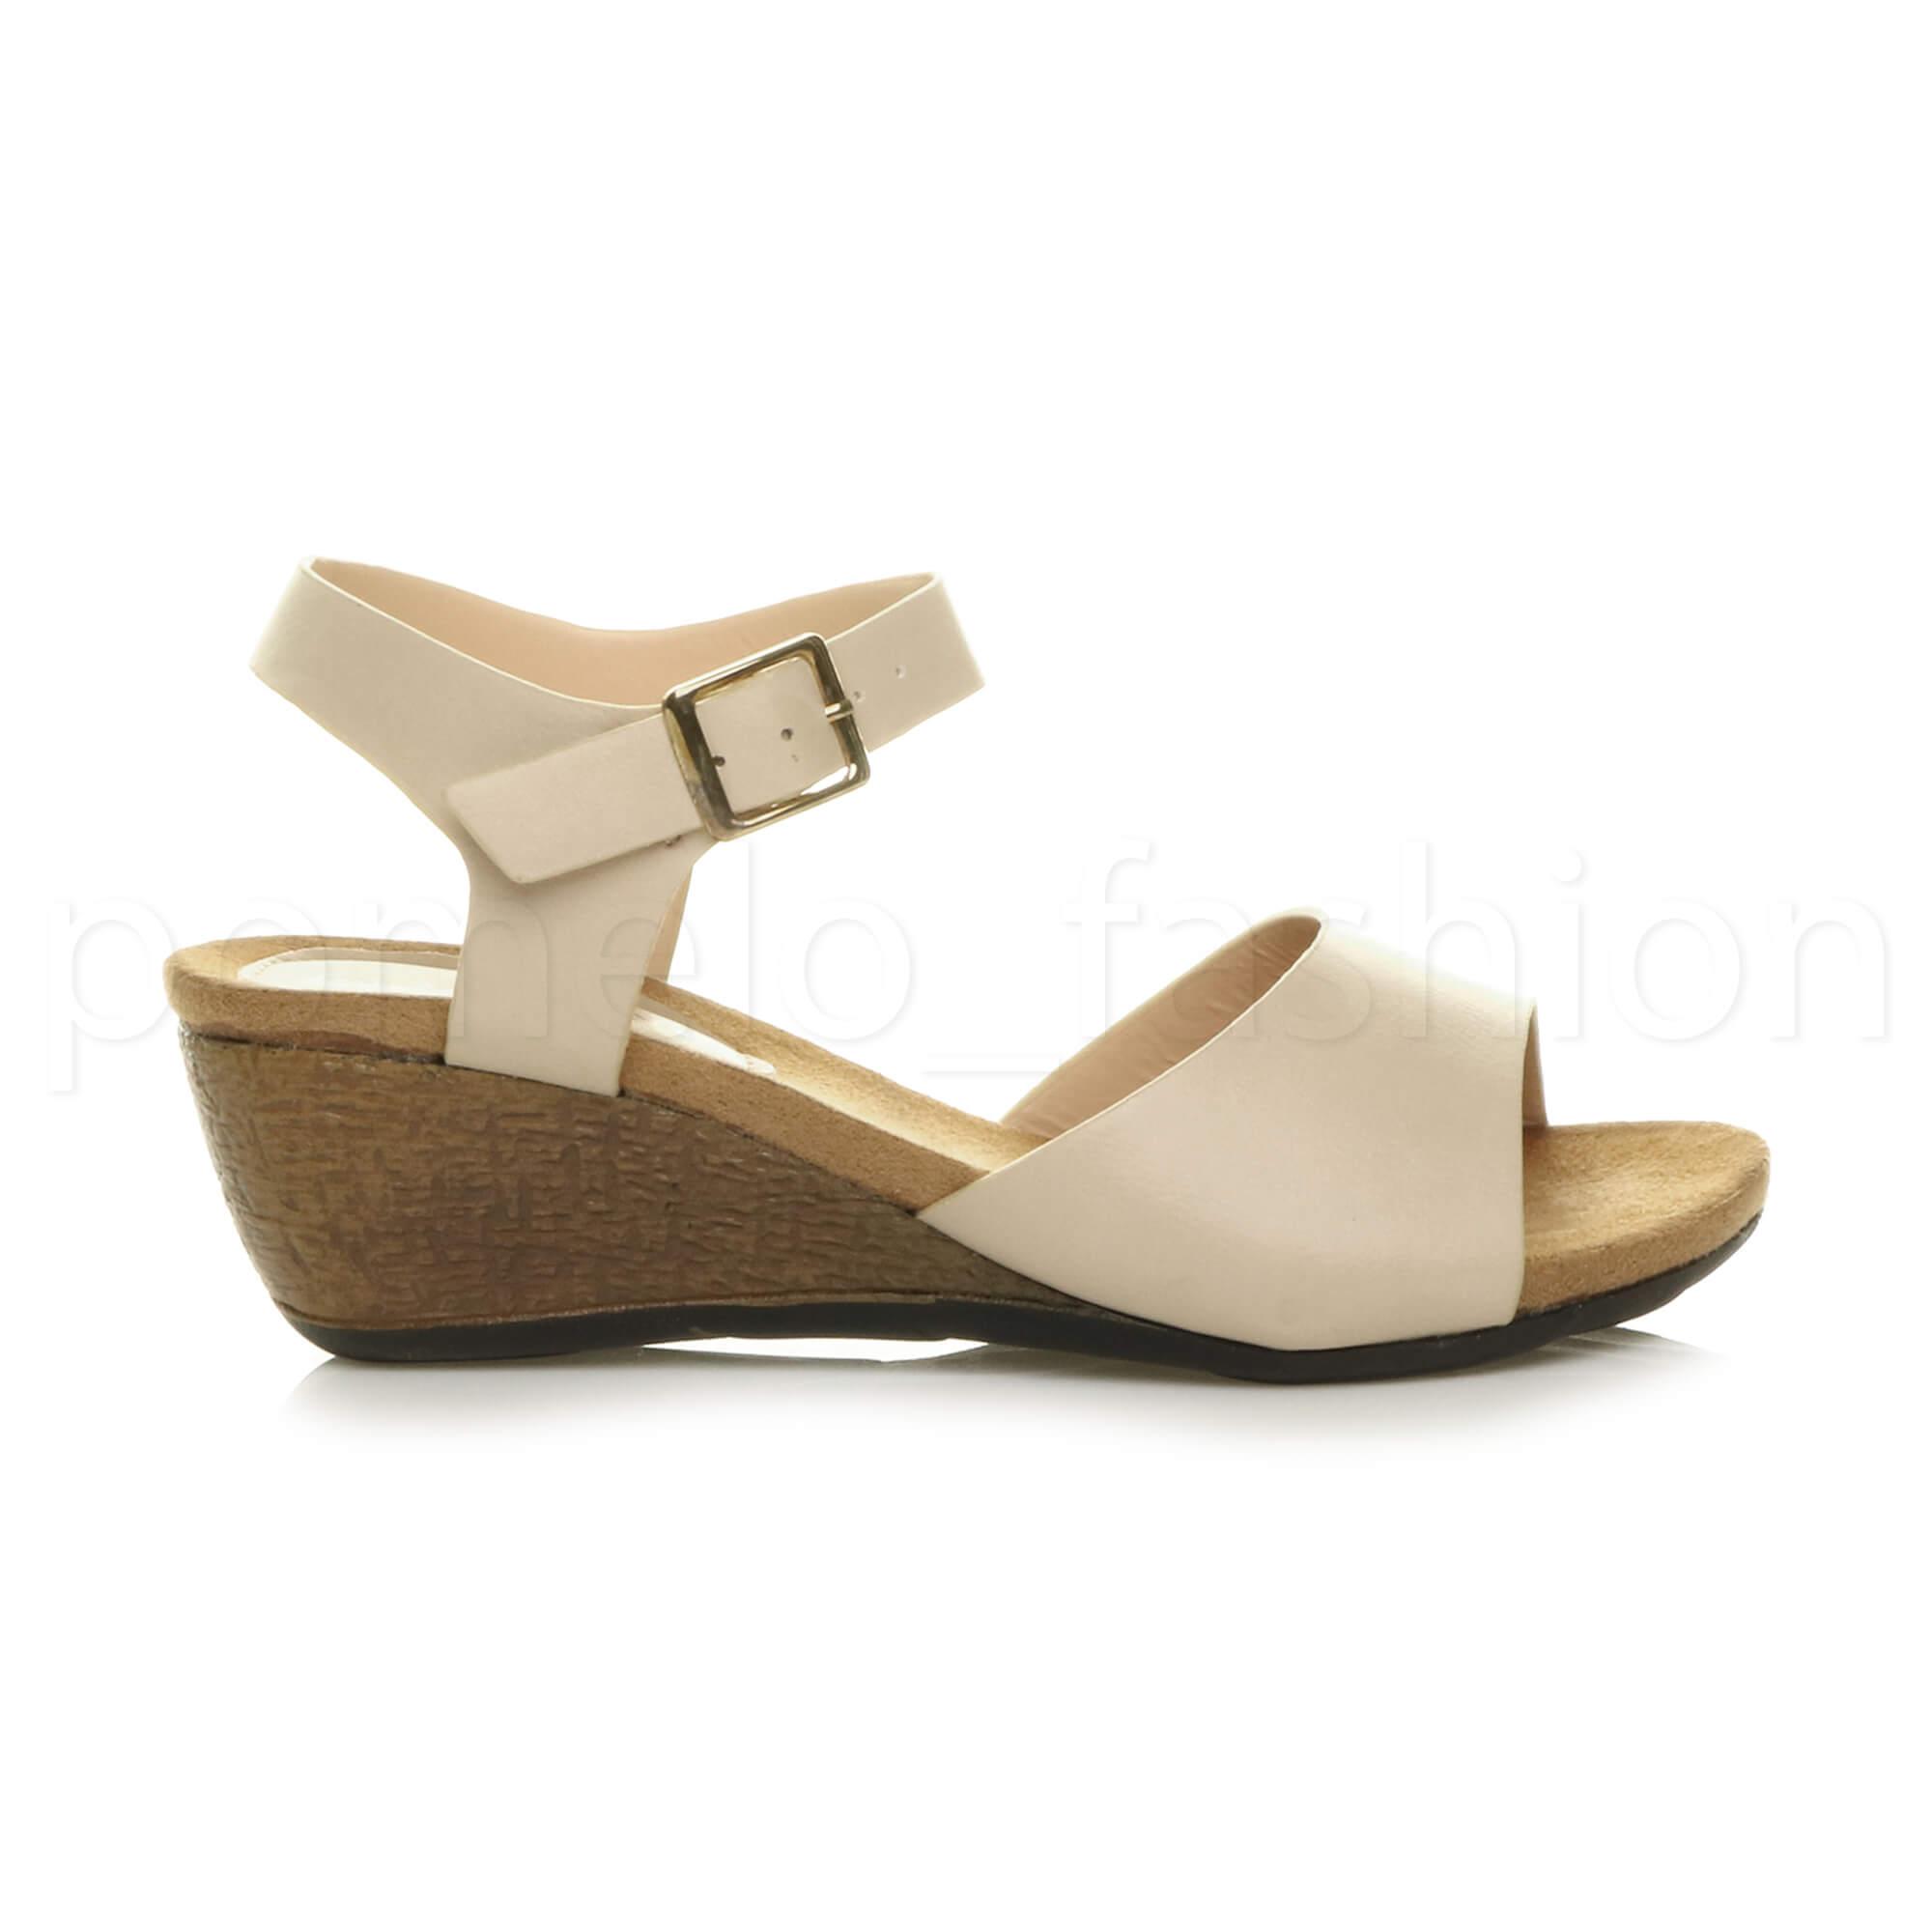 3ad50cd1c5e1 Womens Ladies Platform Mid Heel Wedge Work Smart PEEP Toe Shoes ...